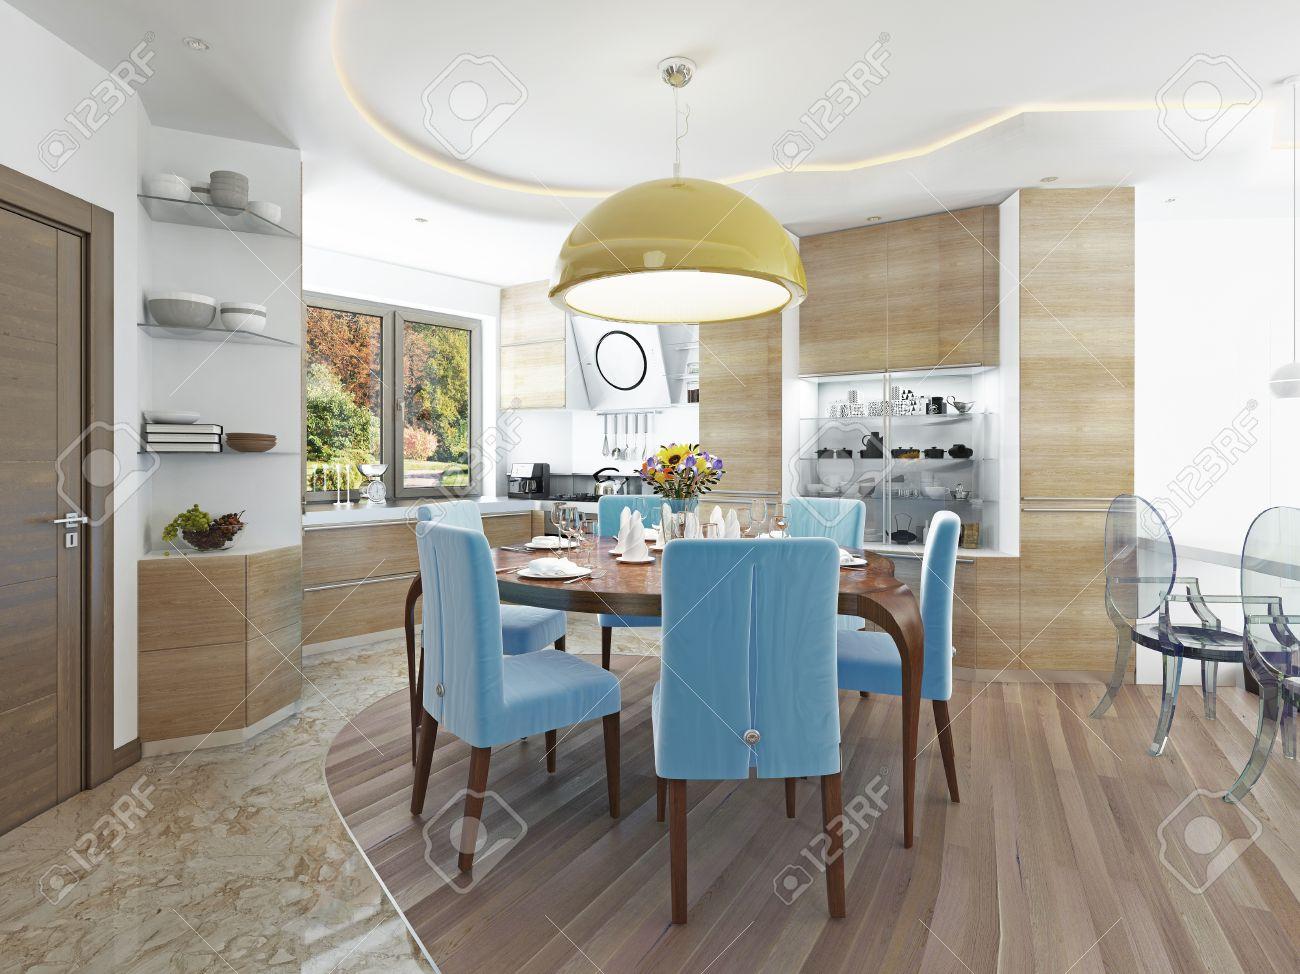 Moderne Salle A Manger Avec Cuisine Dans Un Kitsch Style Branche